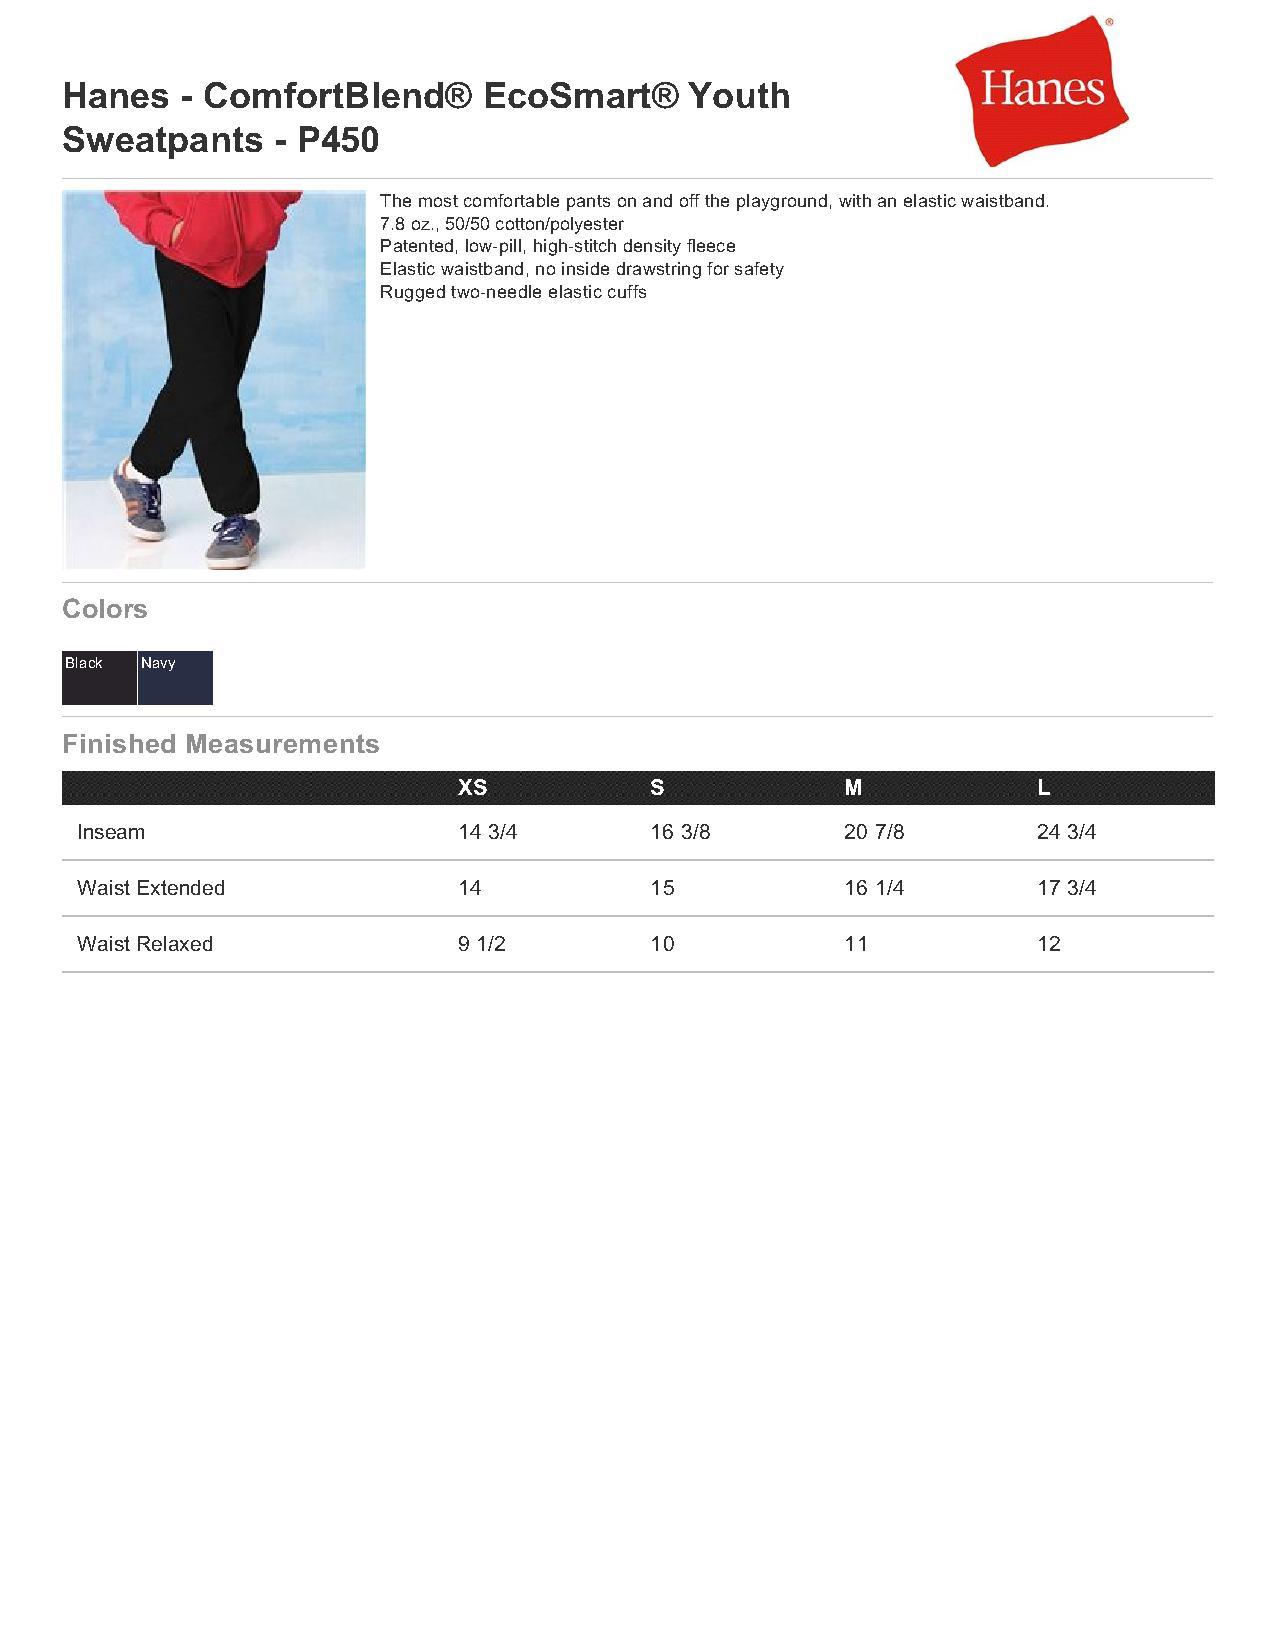 e1755f48d3a2 Hanes P450 - ComfortBlend EcoSmart Youth Sweatpants $7.86 - Men's Pants